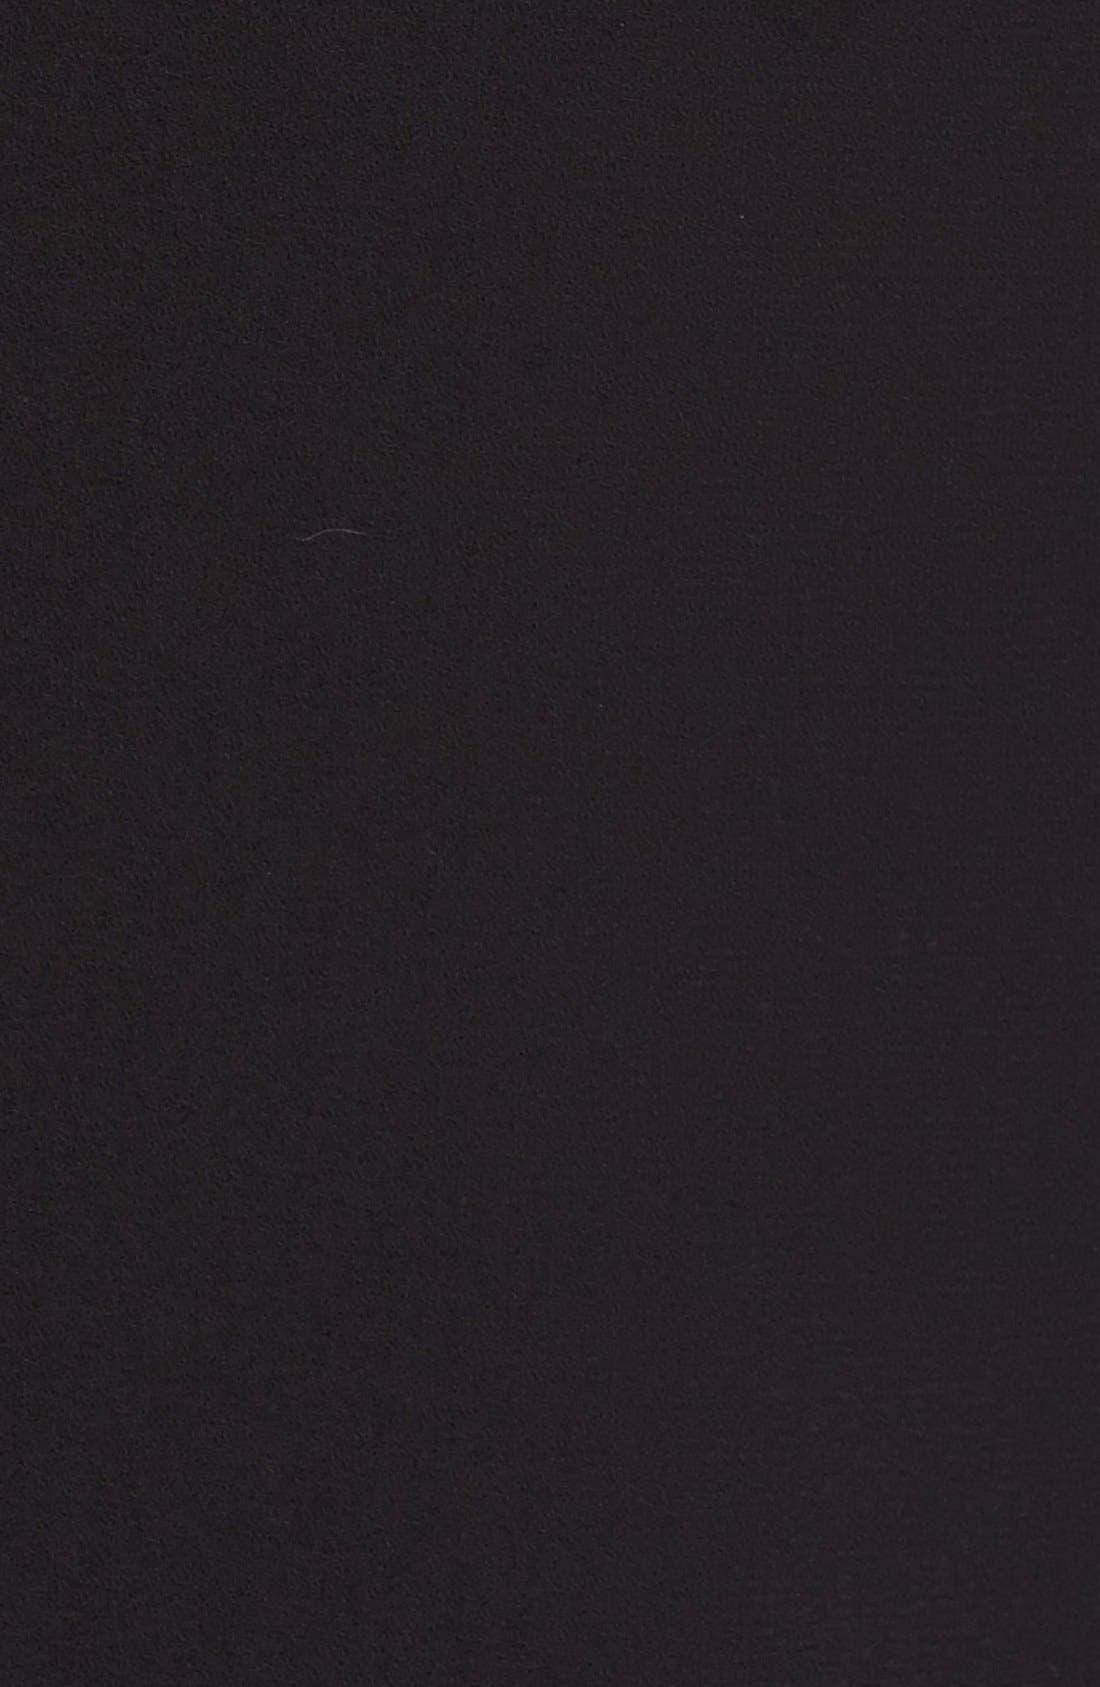 ALICE + OLIVIA,                             'Jeri' Beaded Bodice Strapless Jumpsuit,                             Alternate thumbnail 6, color,                             001